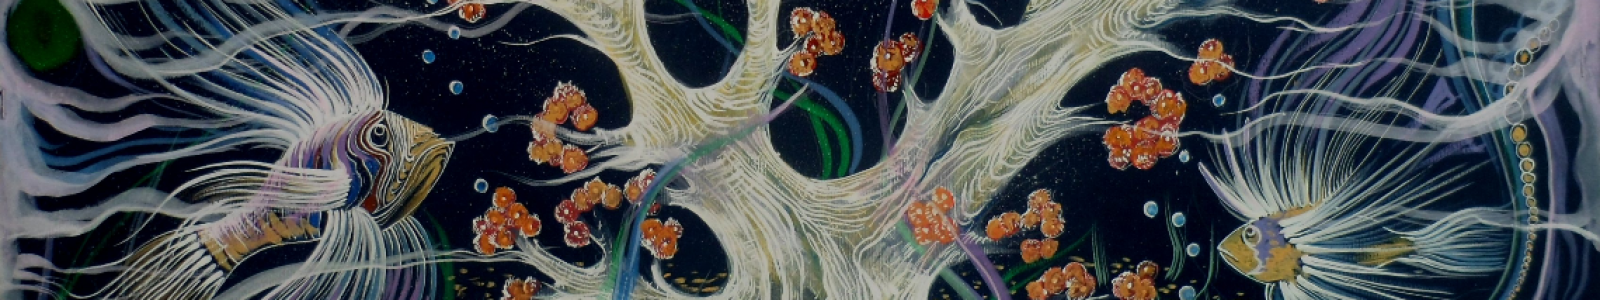 Gallery Painter Ani Petrosyan